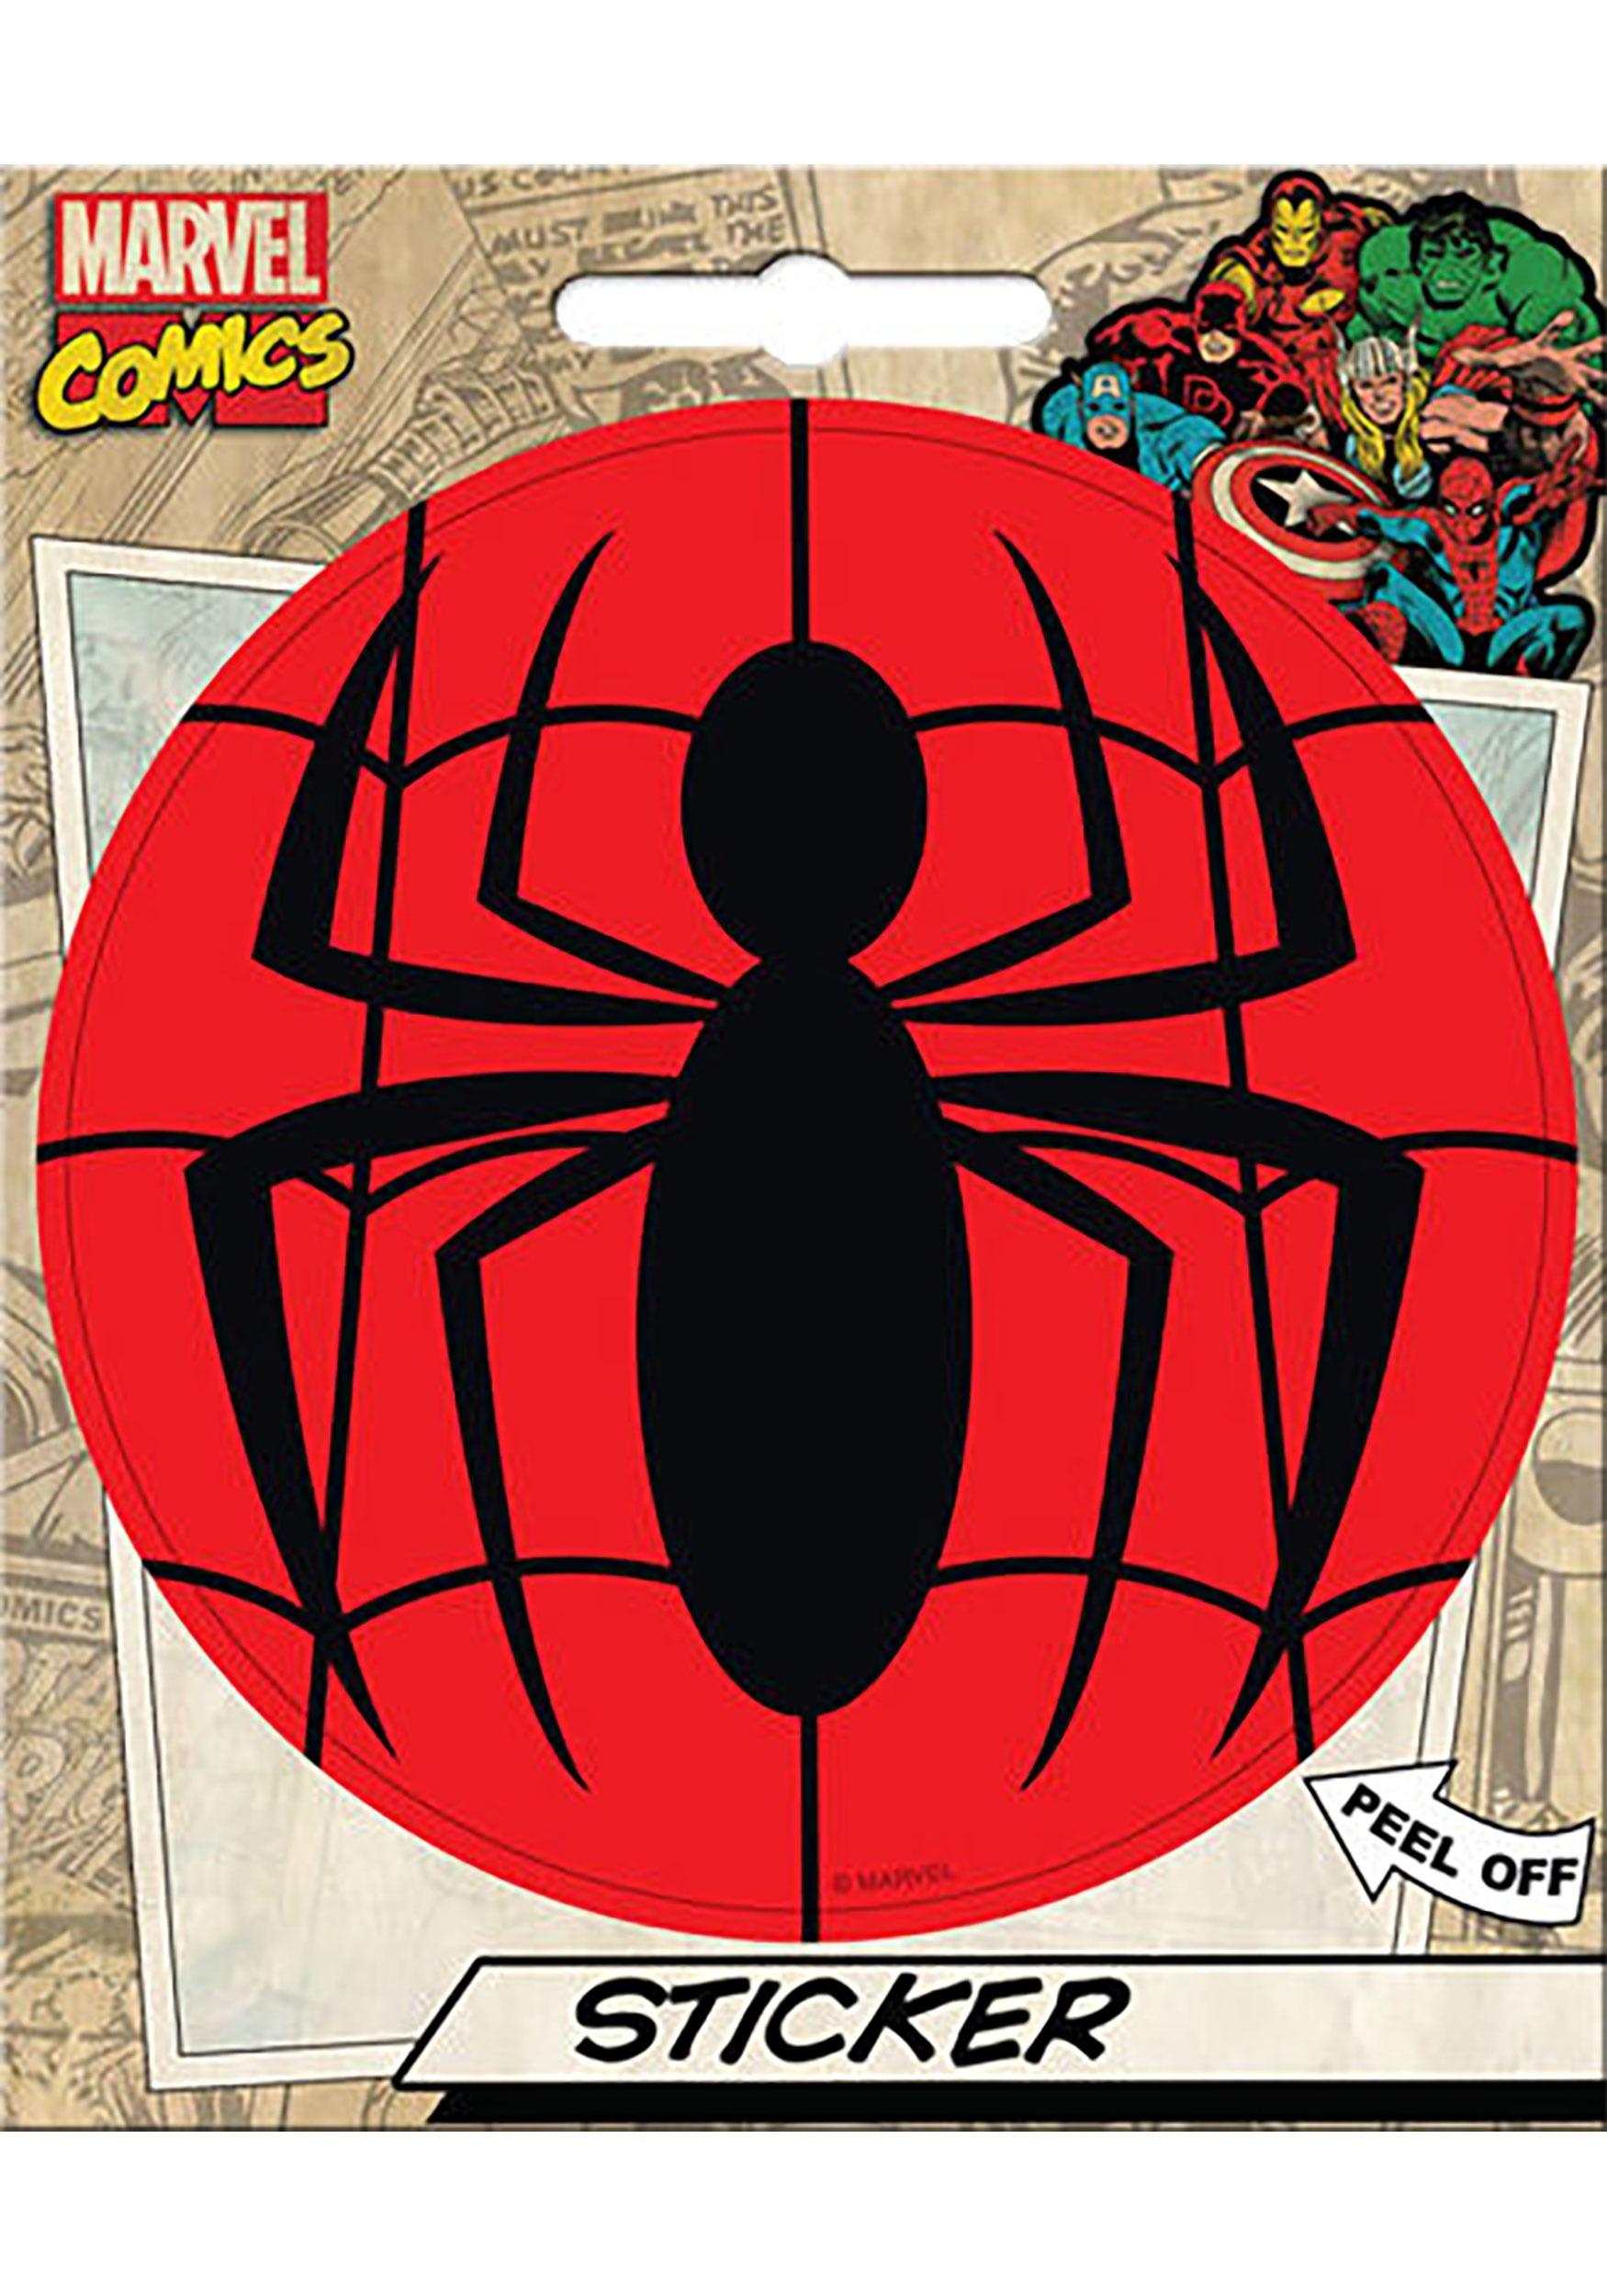 Marvel Spider-Man Sticker ATA45183S